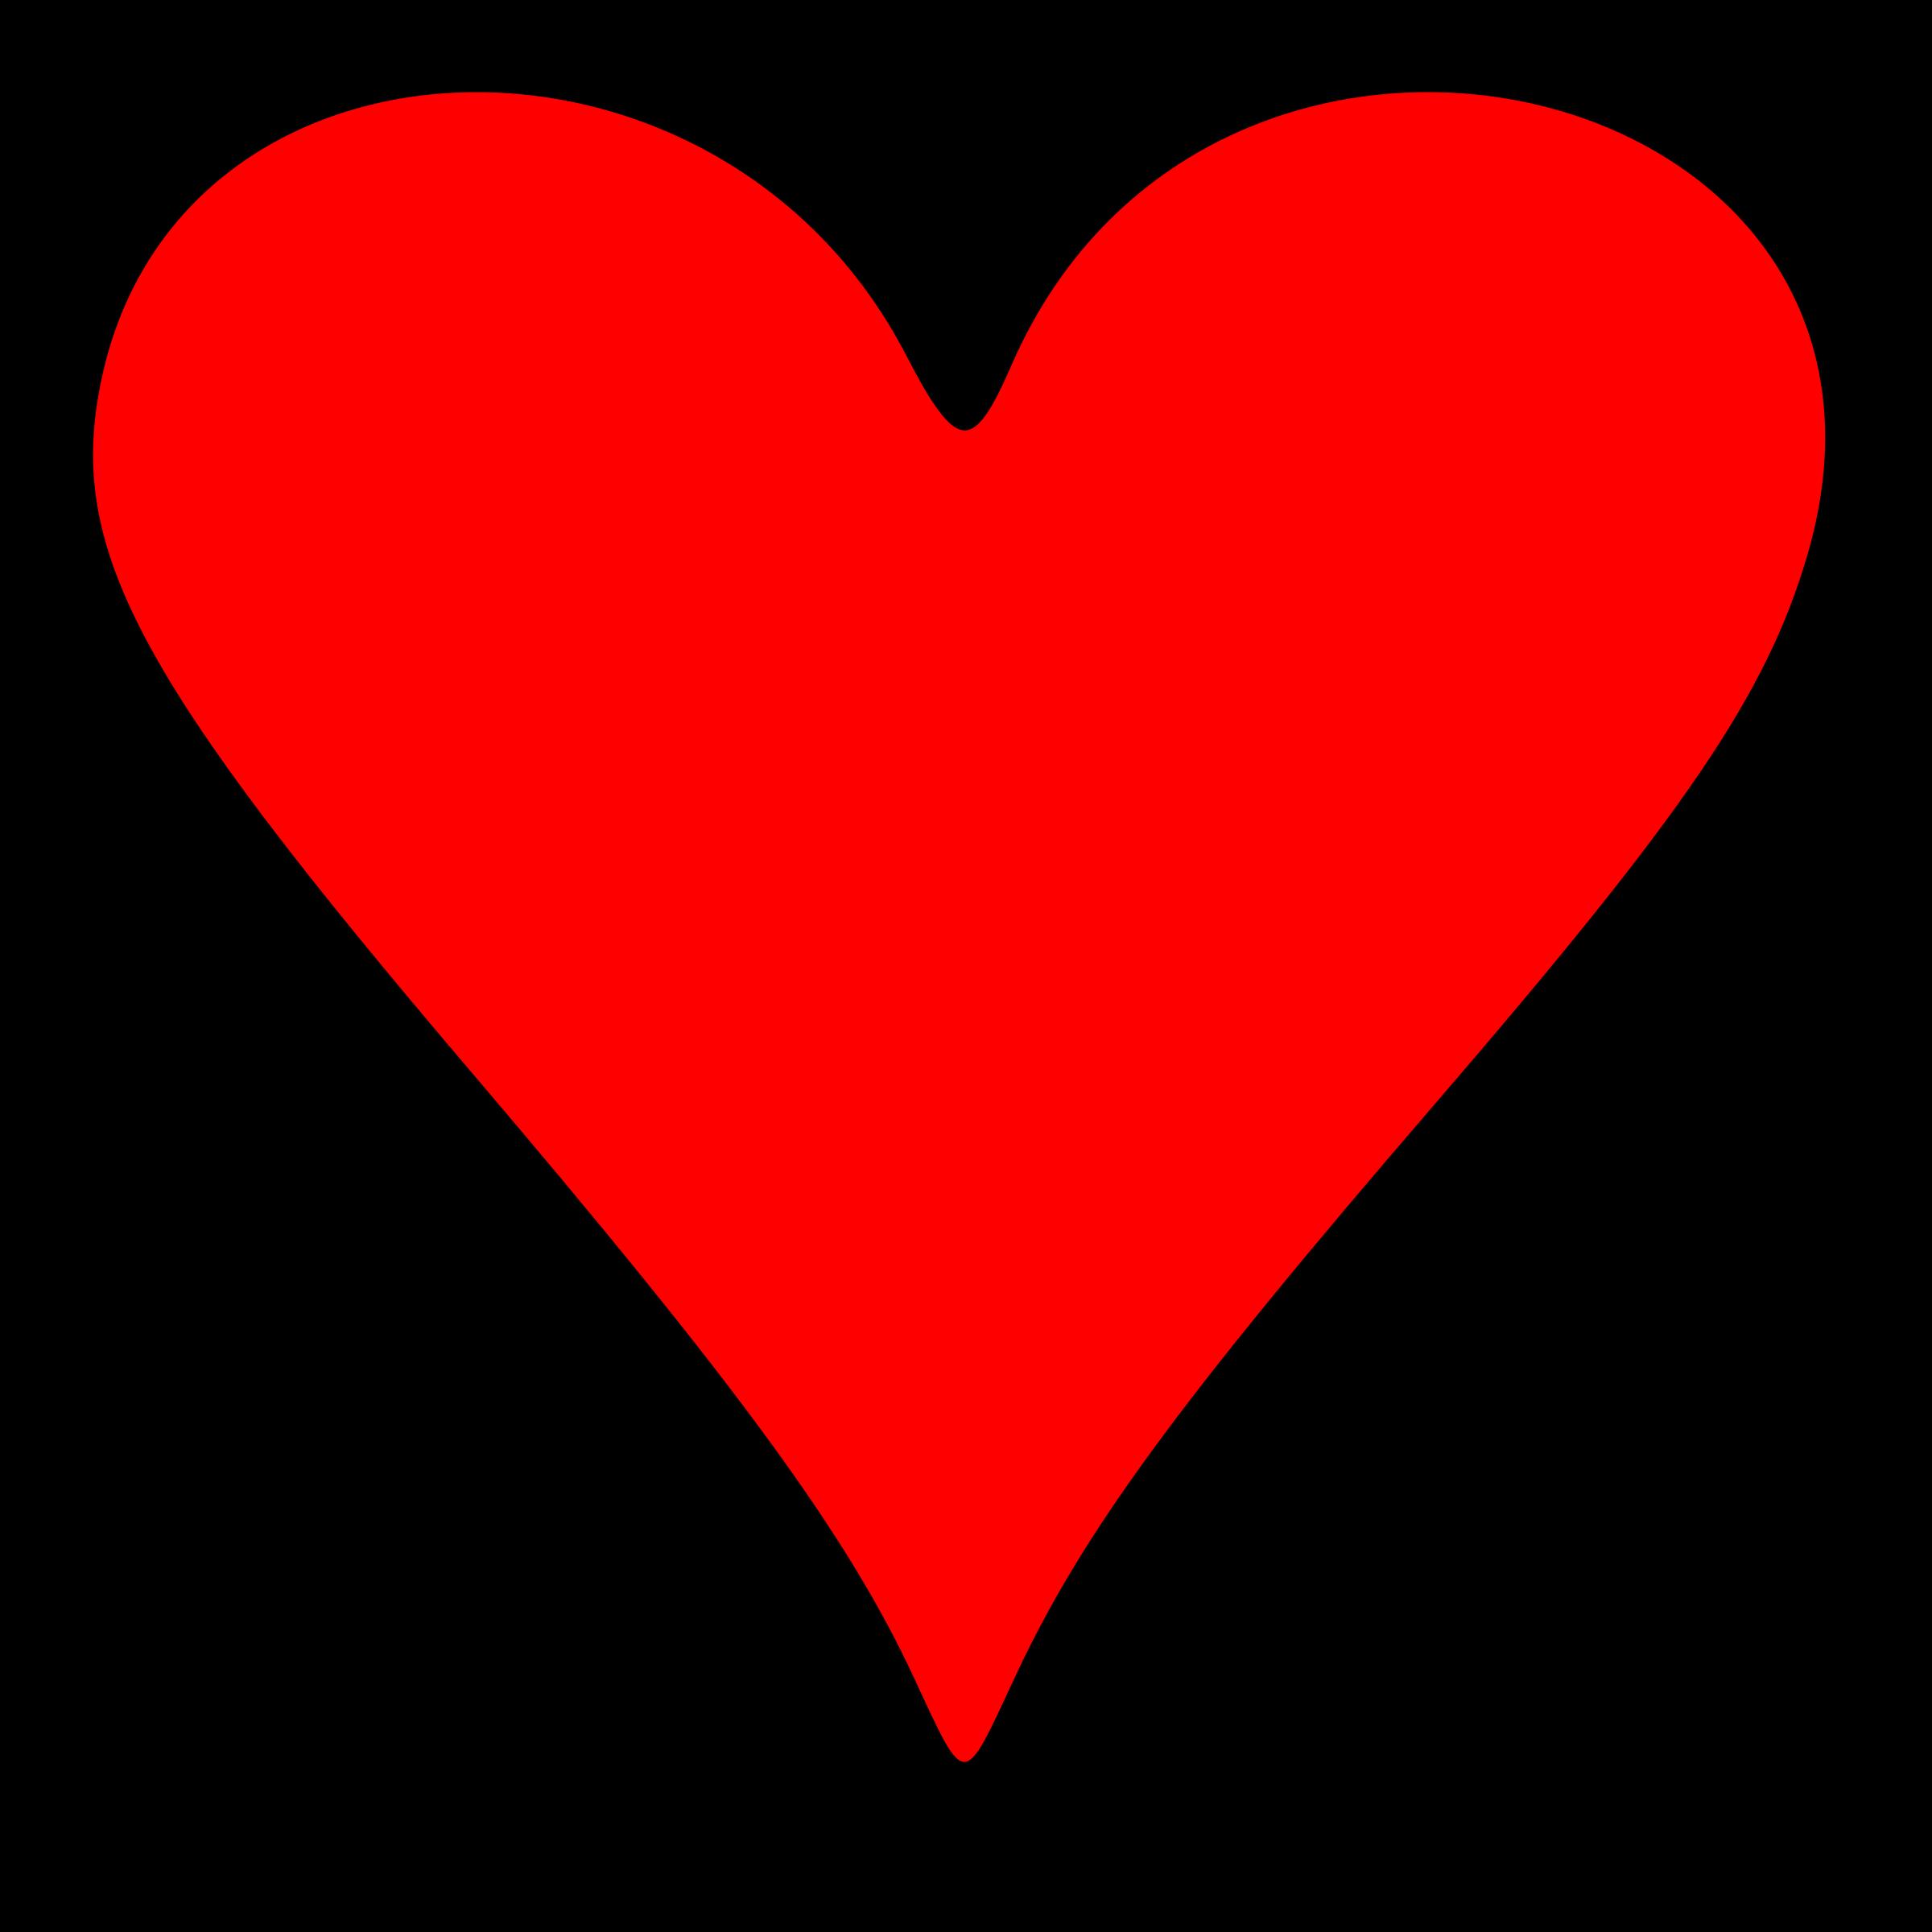 Heart symbol desktop backgrounds. Hearts clipart sign